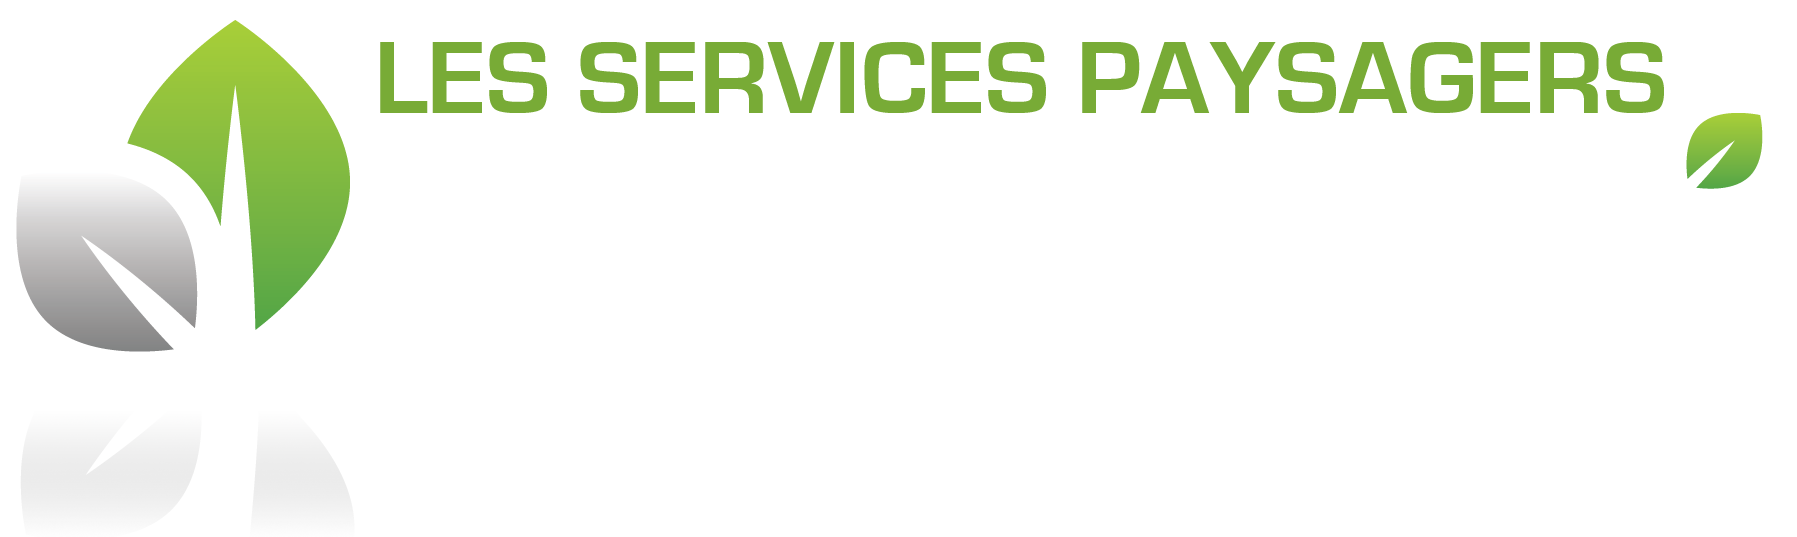 Les Services Paysagers S. Masson